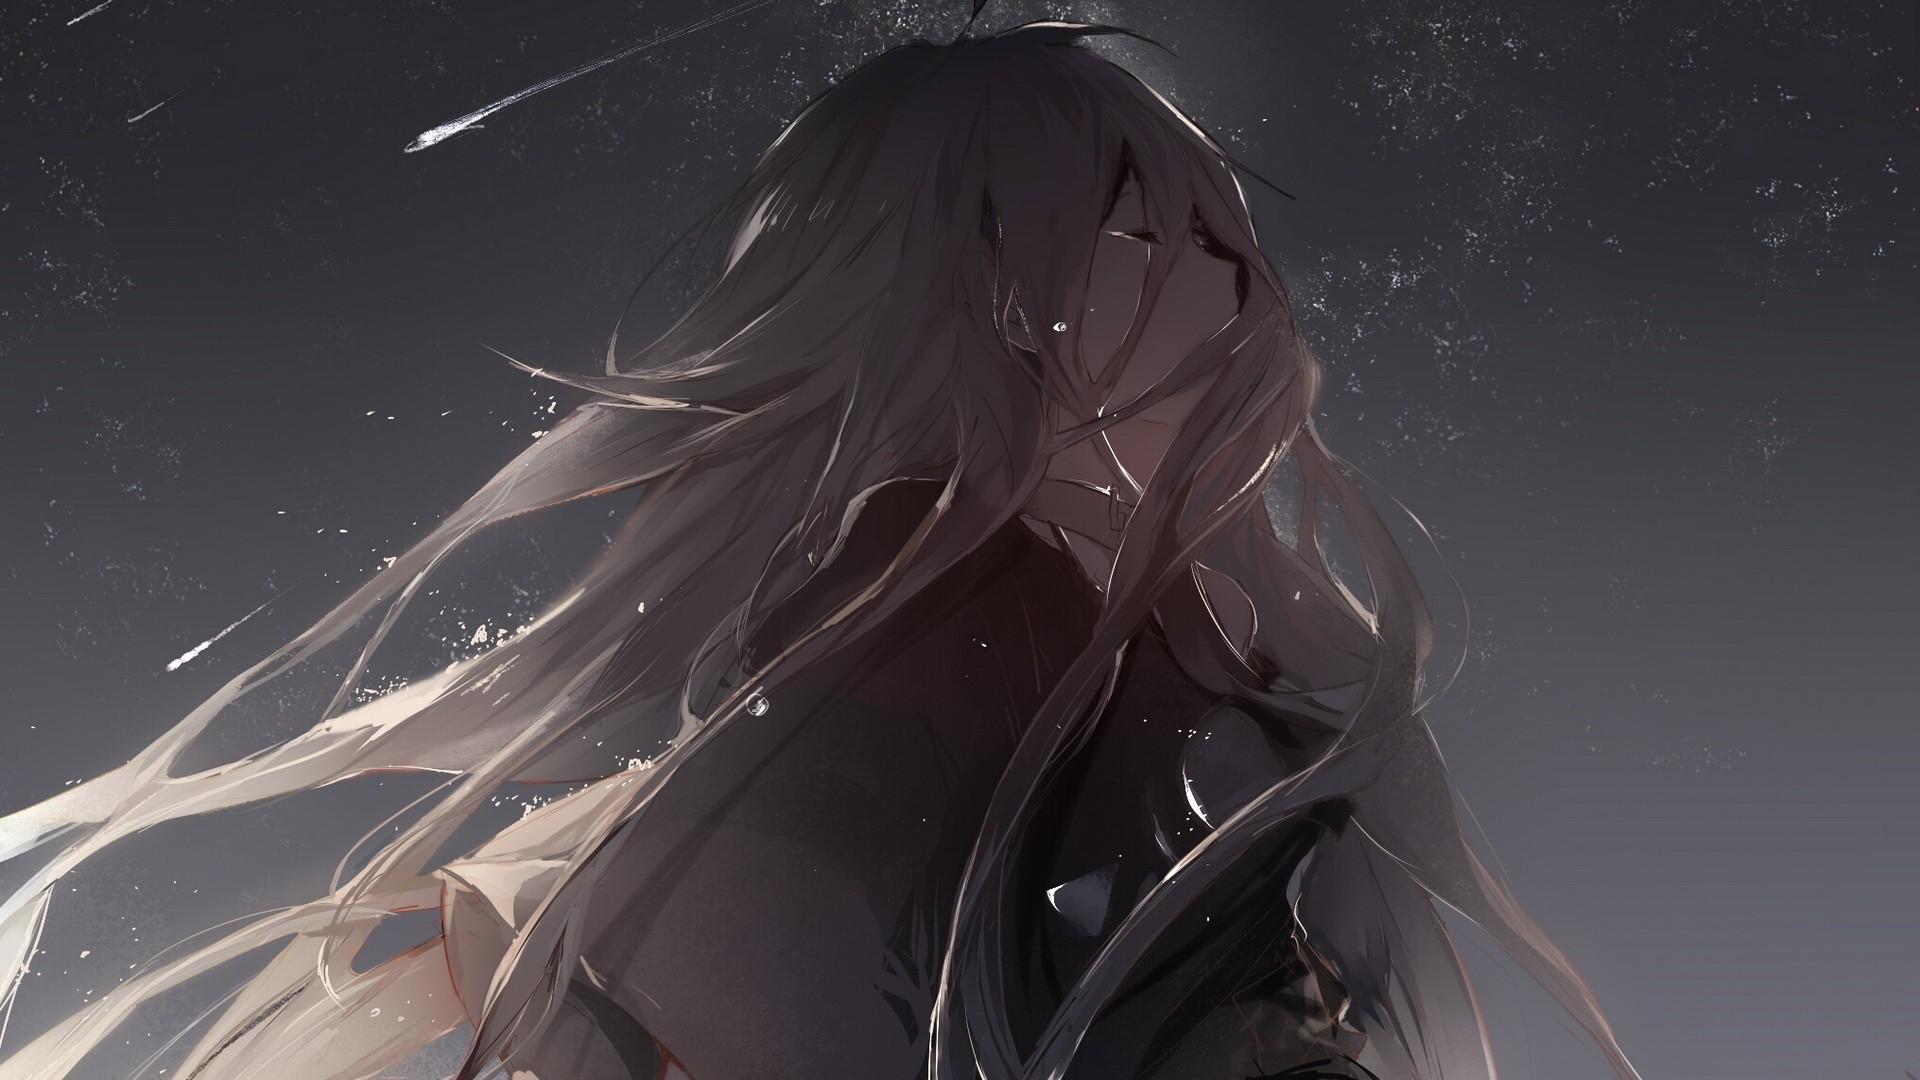 Sad Anime wallpapers - HD wallpaper Collections ...